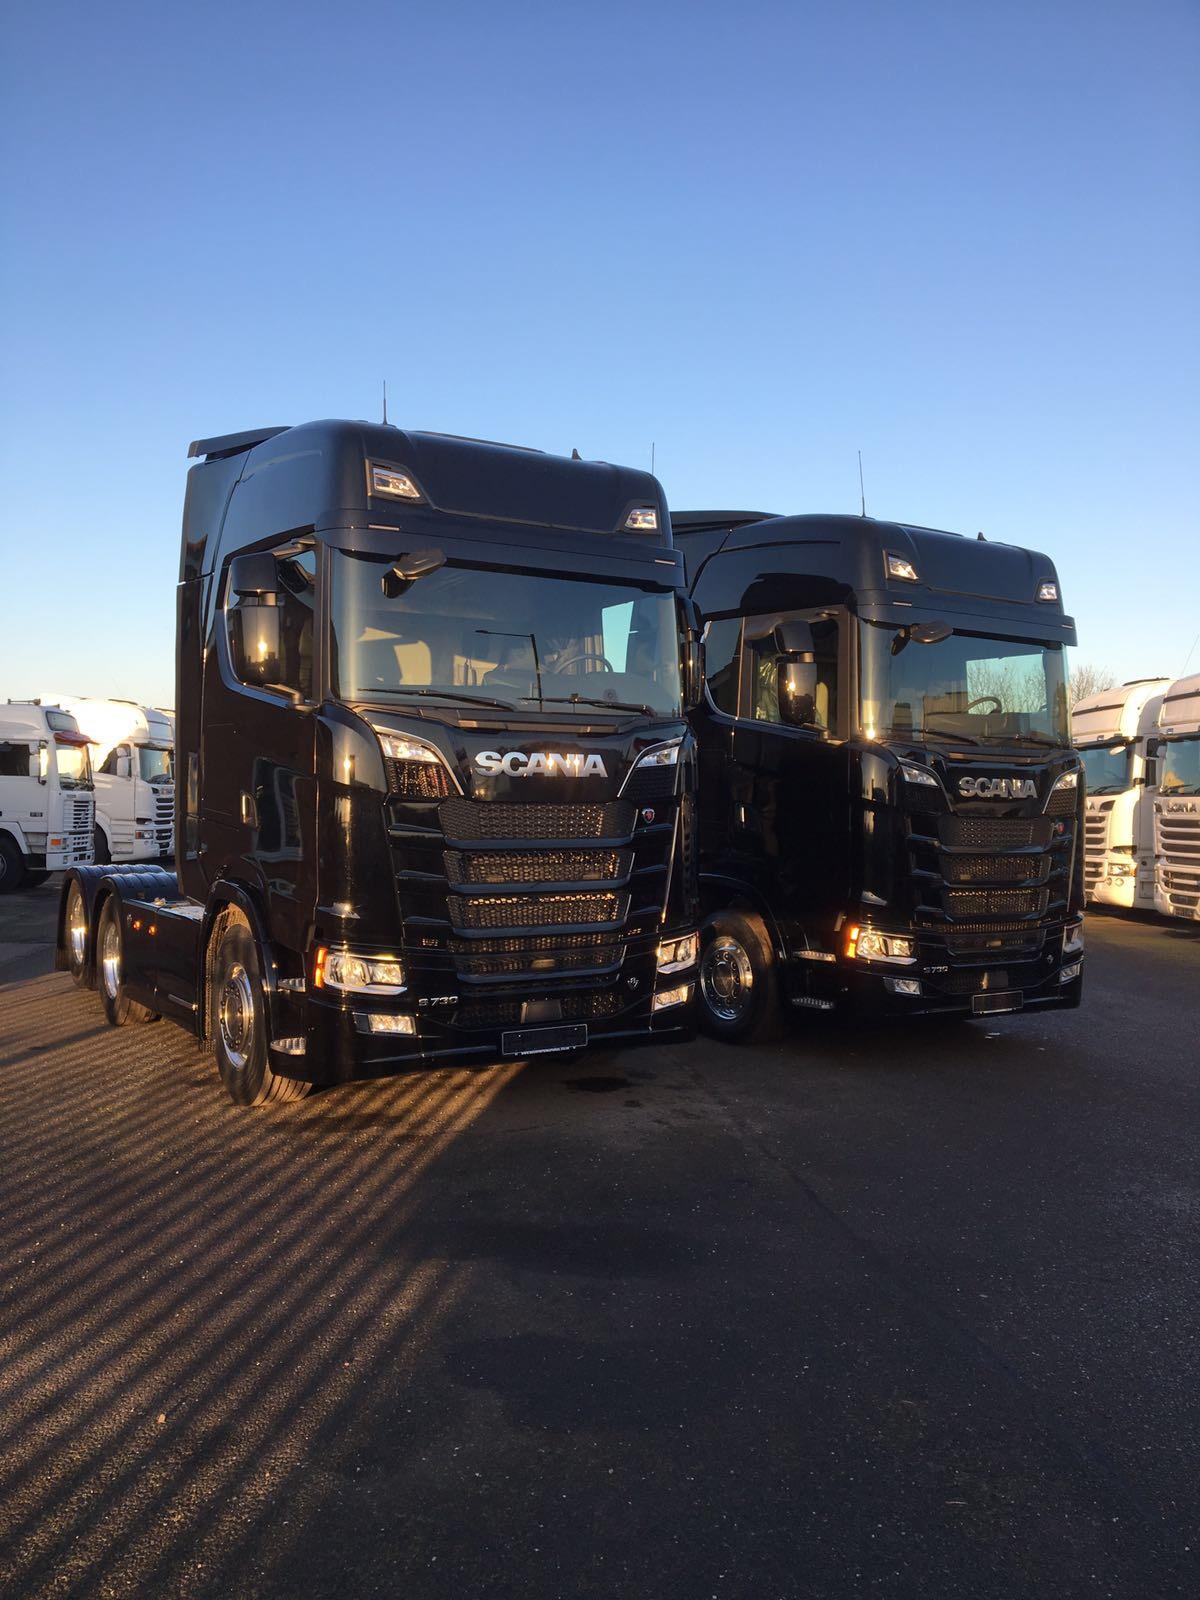 SCOOP!! Scania S730 in Stock | www truckblog co uk